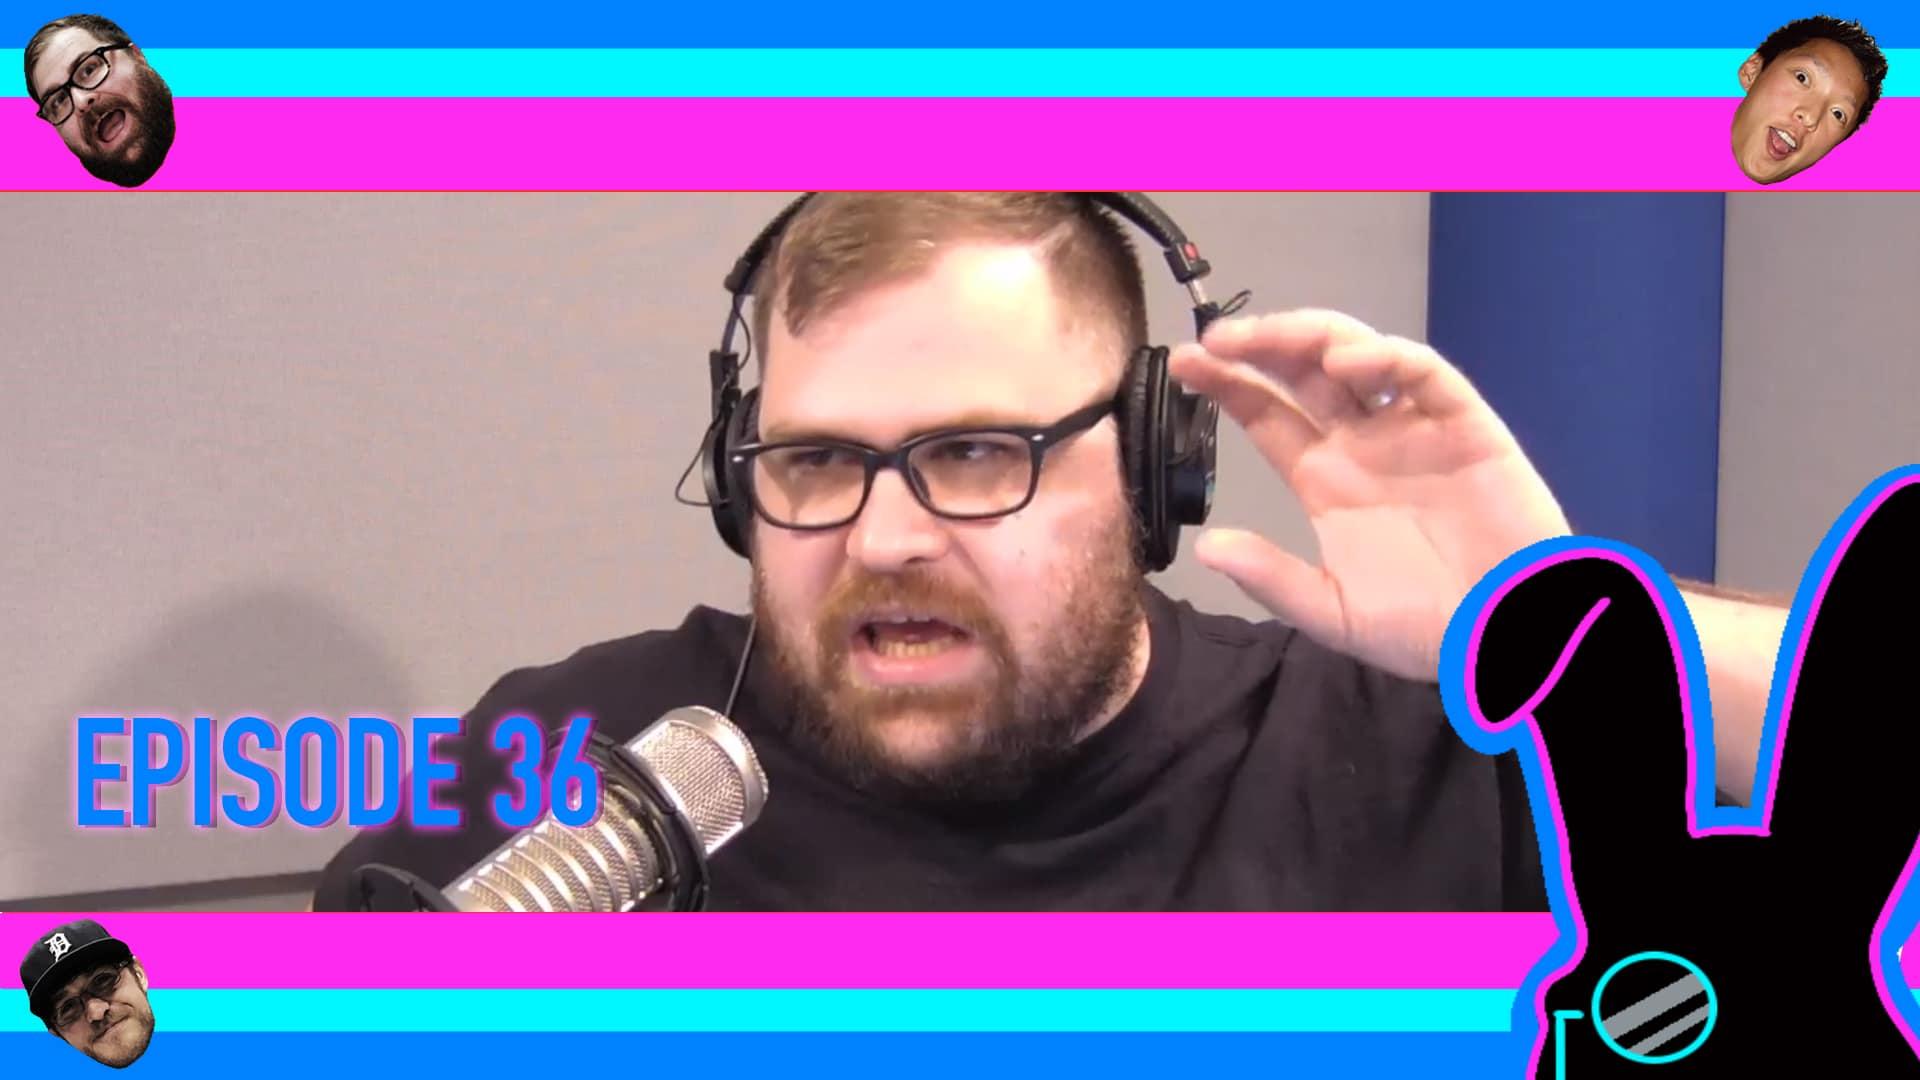 Geektainment Weekly - Episode 36